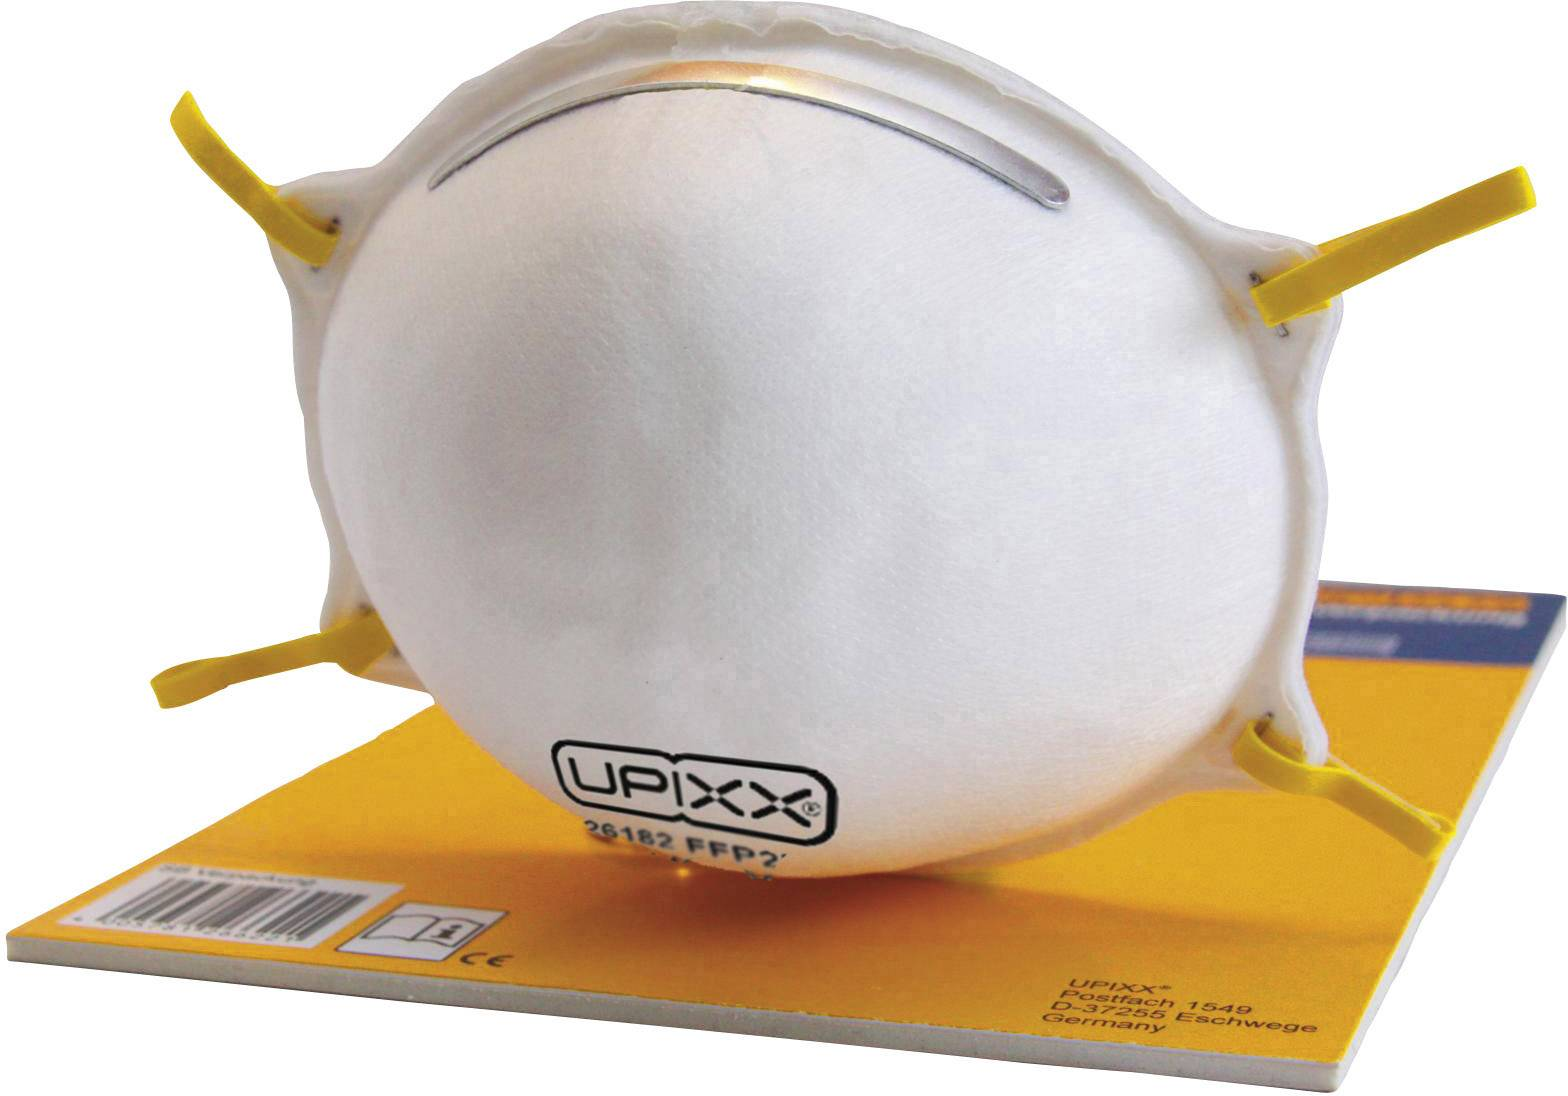 Respirátor proti jemnému prachu L+D Upixx 26090, 1 ks